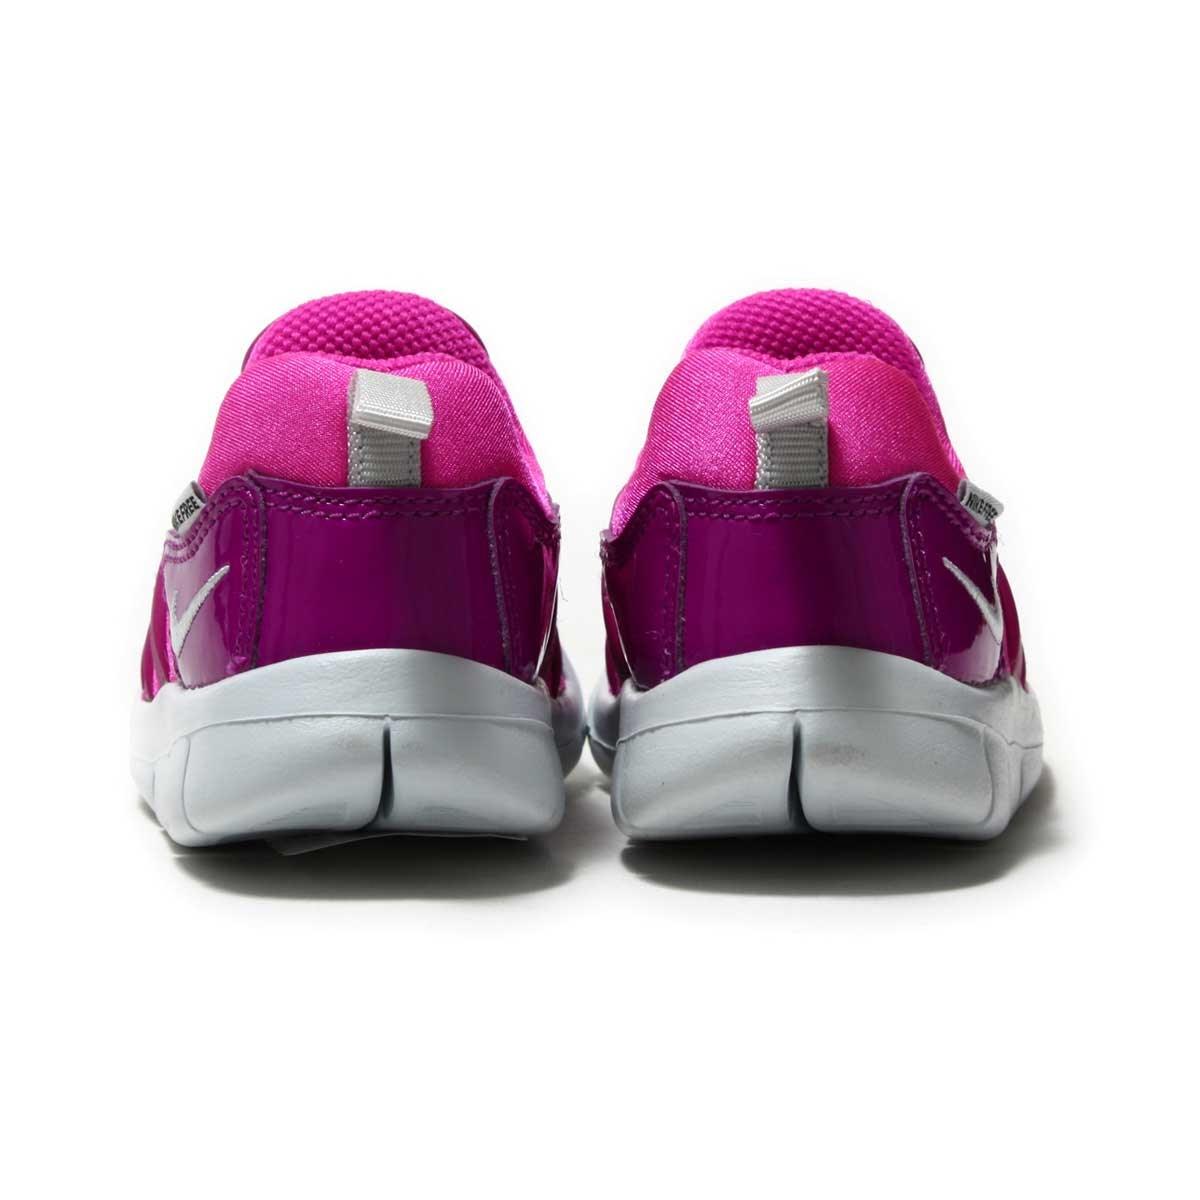 ef426fd5773d NIKE DYNAMO FREE (TD) (Nike dynamo-free TD) FIRE PINK PURE PLATINUM-BOLD  BERRY-BLACK 17HO-I